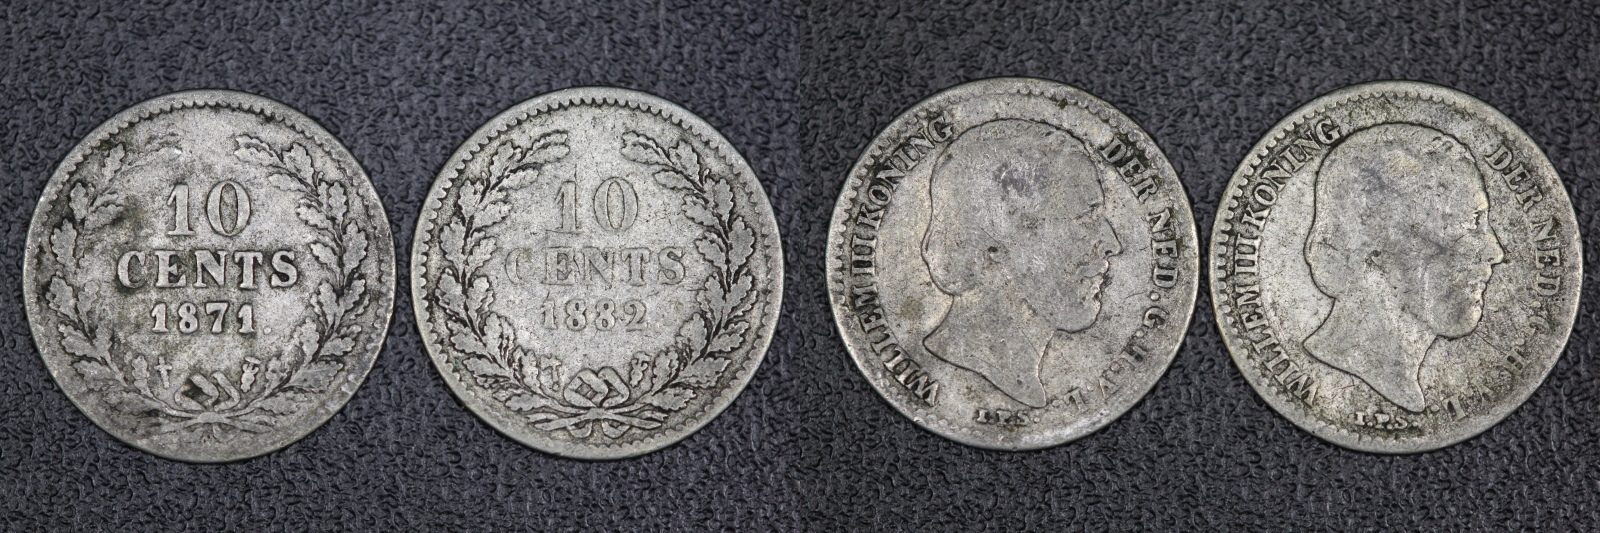 Lot (2 Stück) 10 Cents 1871/ 1882 Niederlande - Willem III. - s/ss